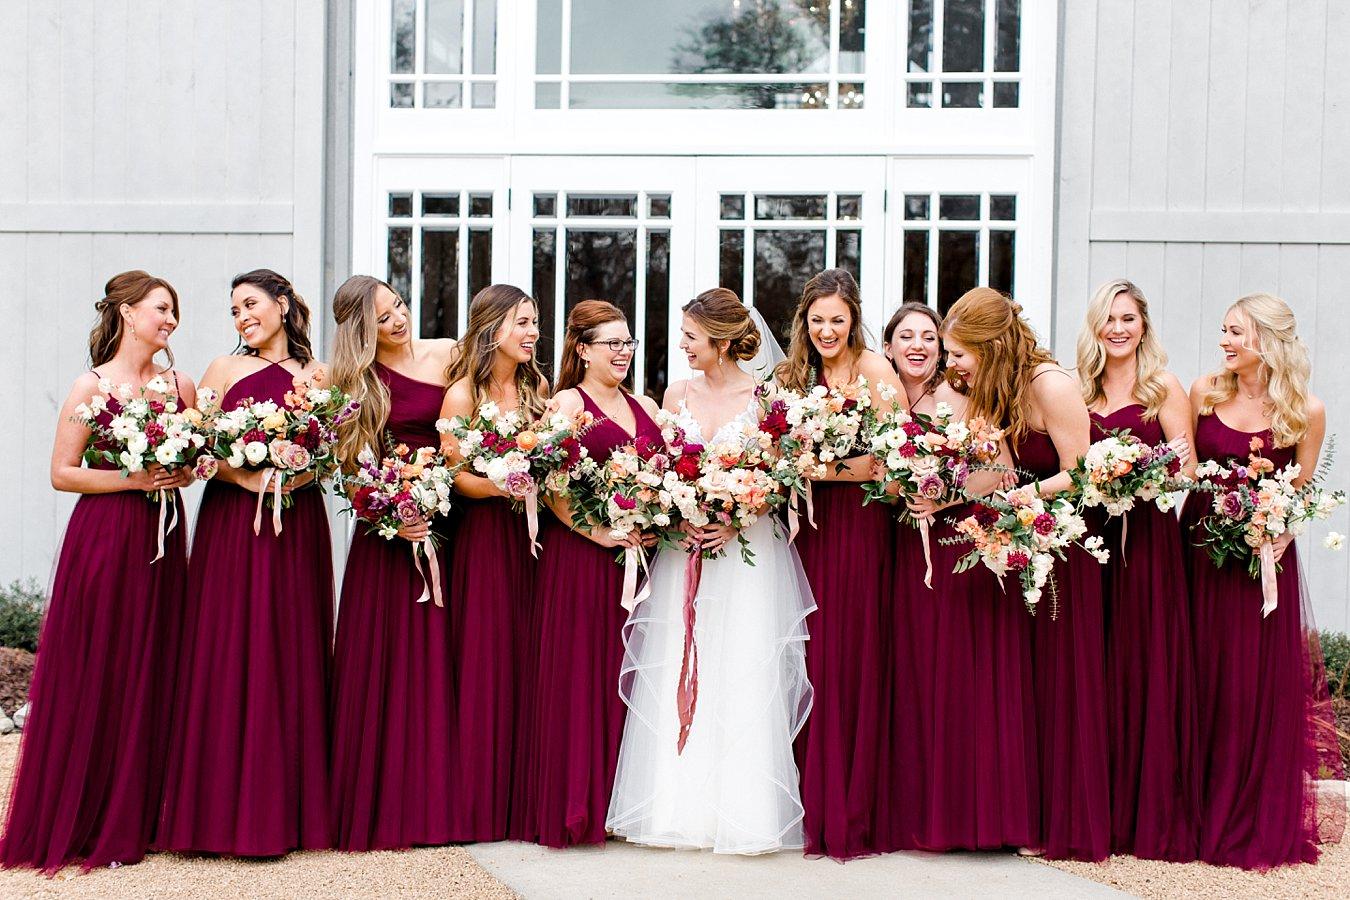 Addison-Grove-Wedding-Photos-Dripping-Springs-TX-4994.jpg